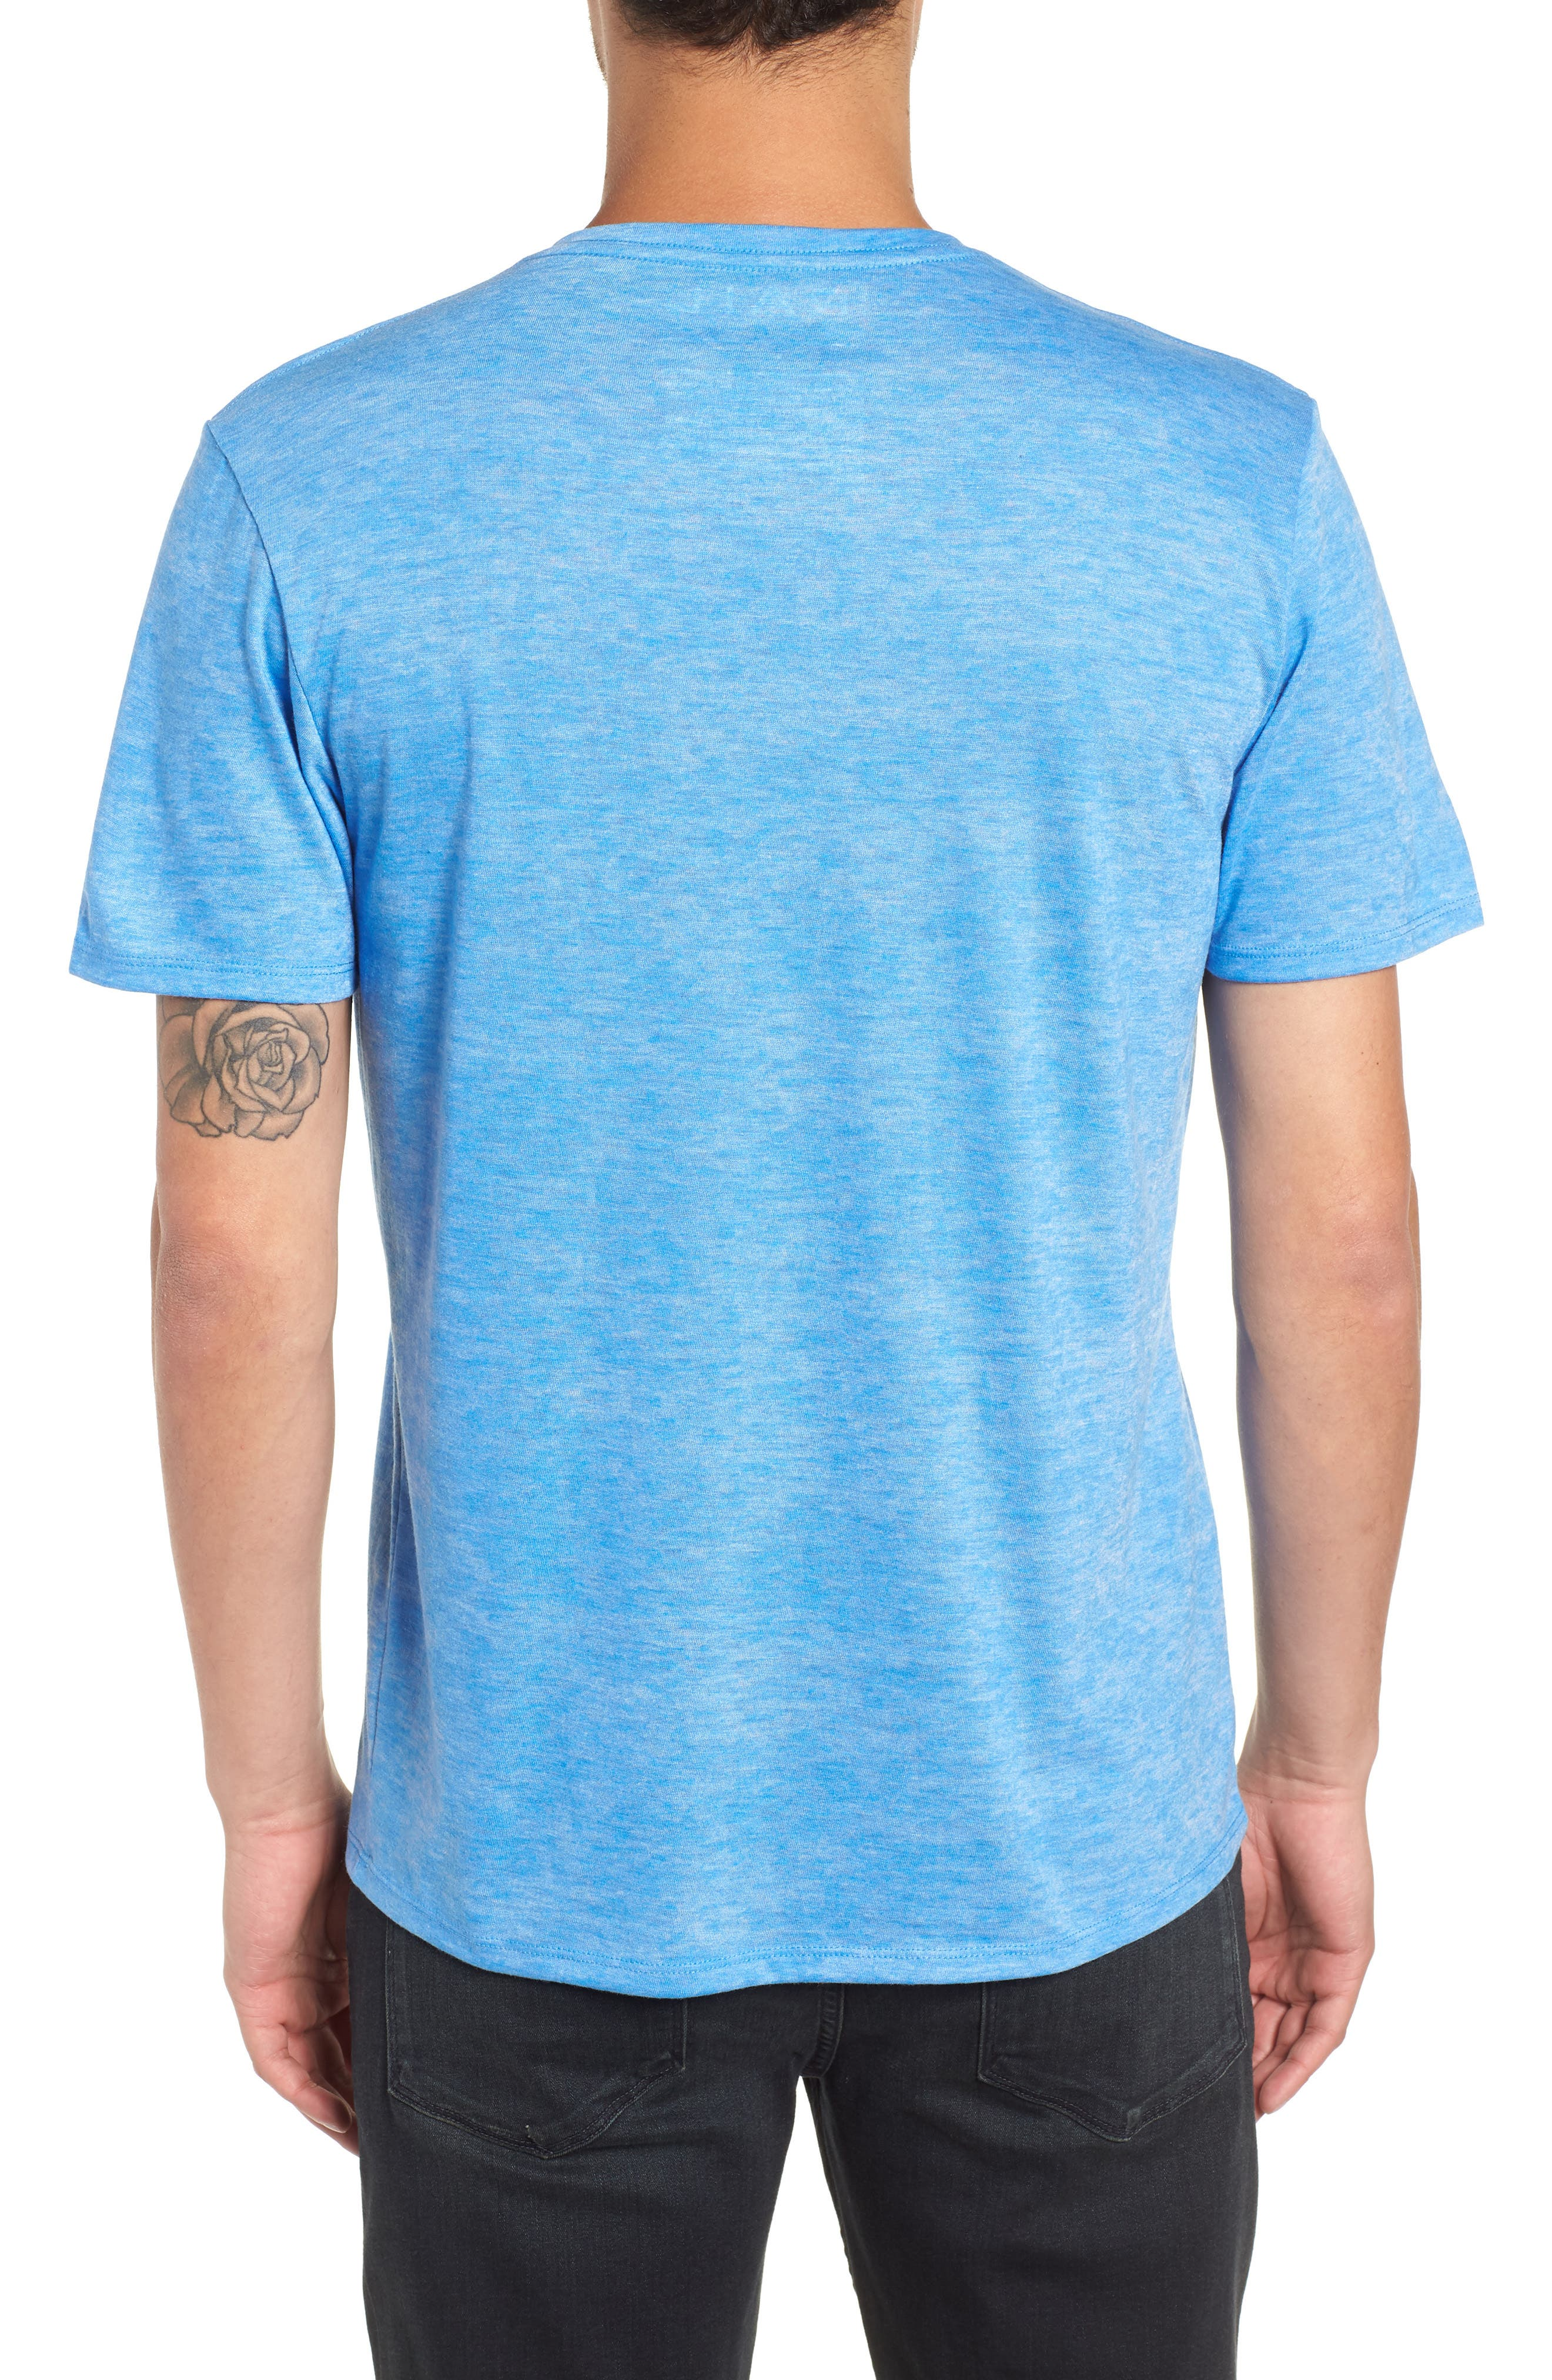 Burnout V-Neck T-Shirt,                             Alternate thumbnail 2, color,                             BLUE BLISS- WHITE BURNOUT